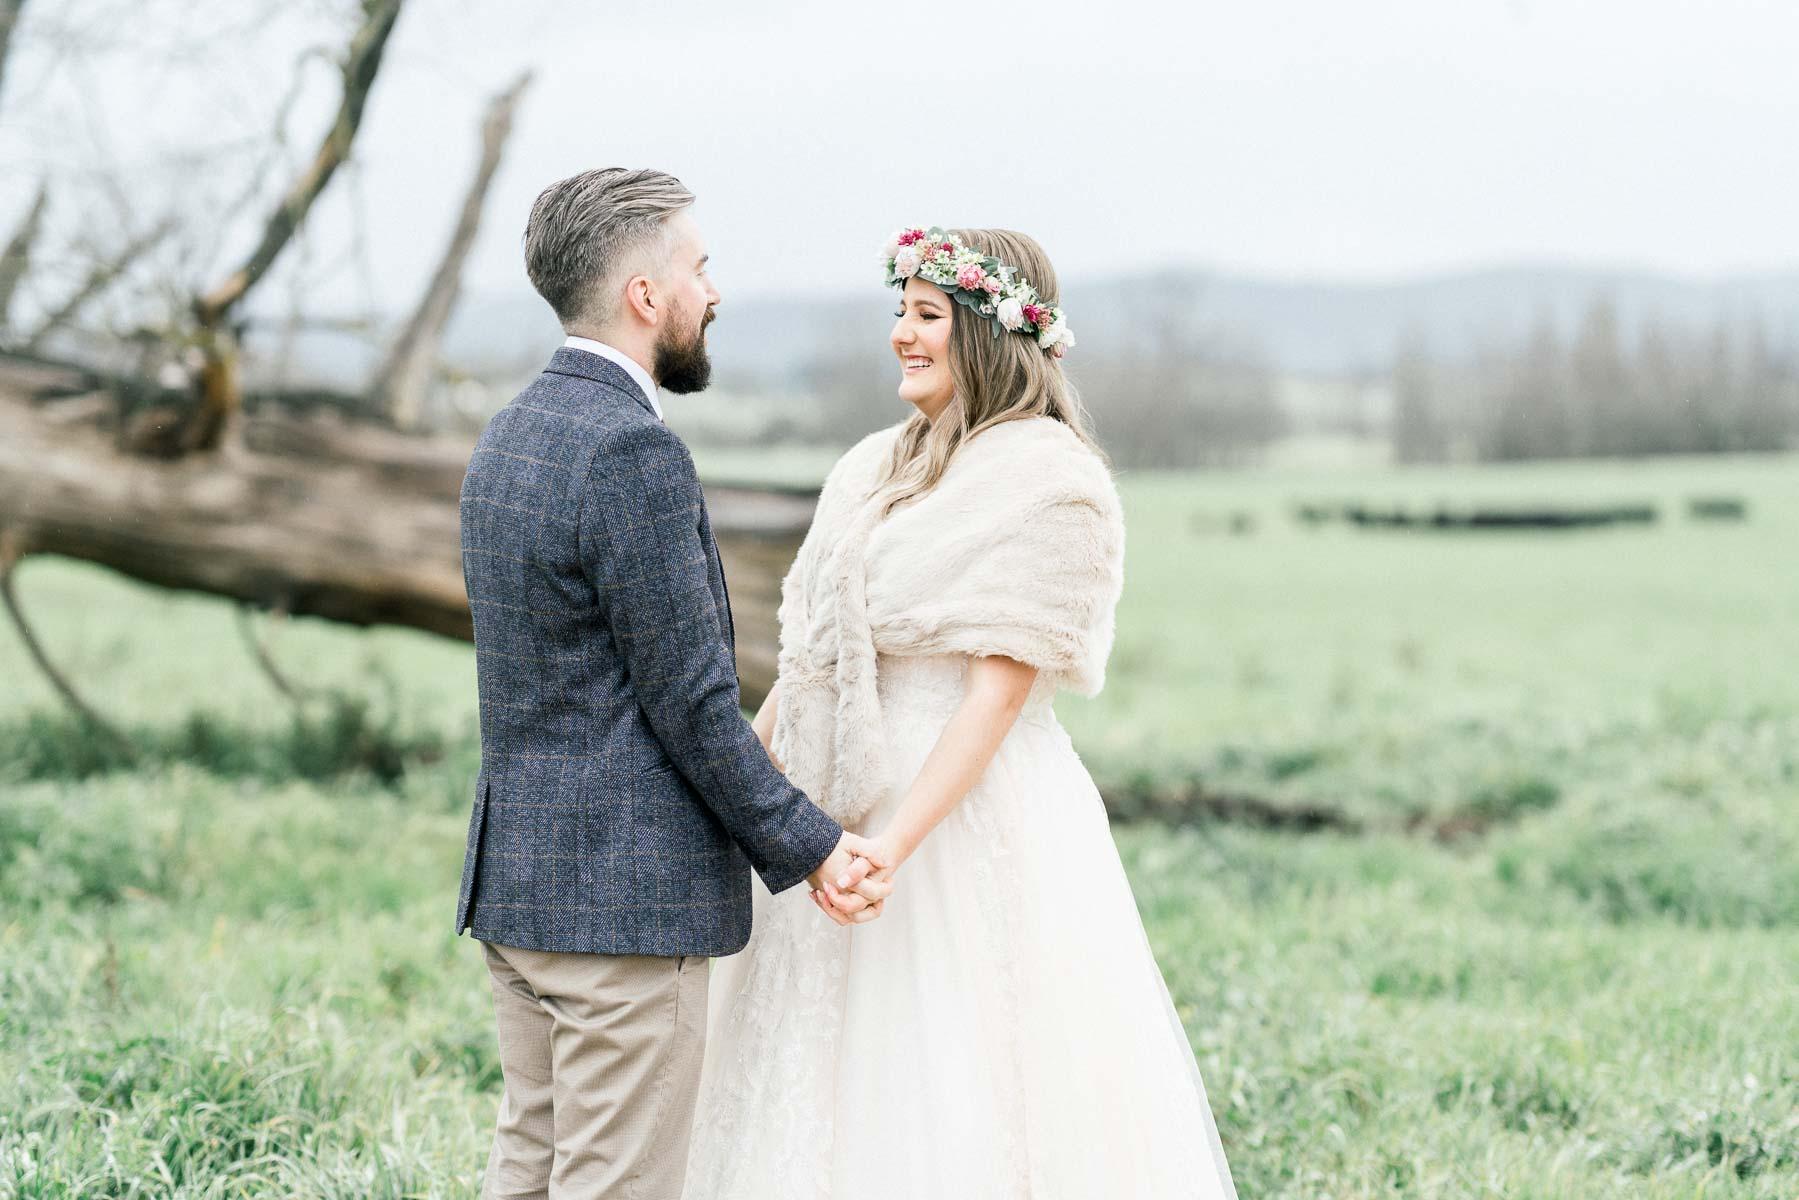 adams-farm-coldstream-yarra-valley-wedding-heart+soul-weddings-kel-jarryd-05642.jpg